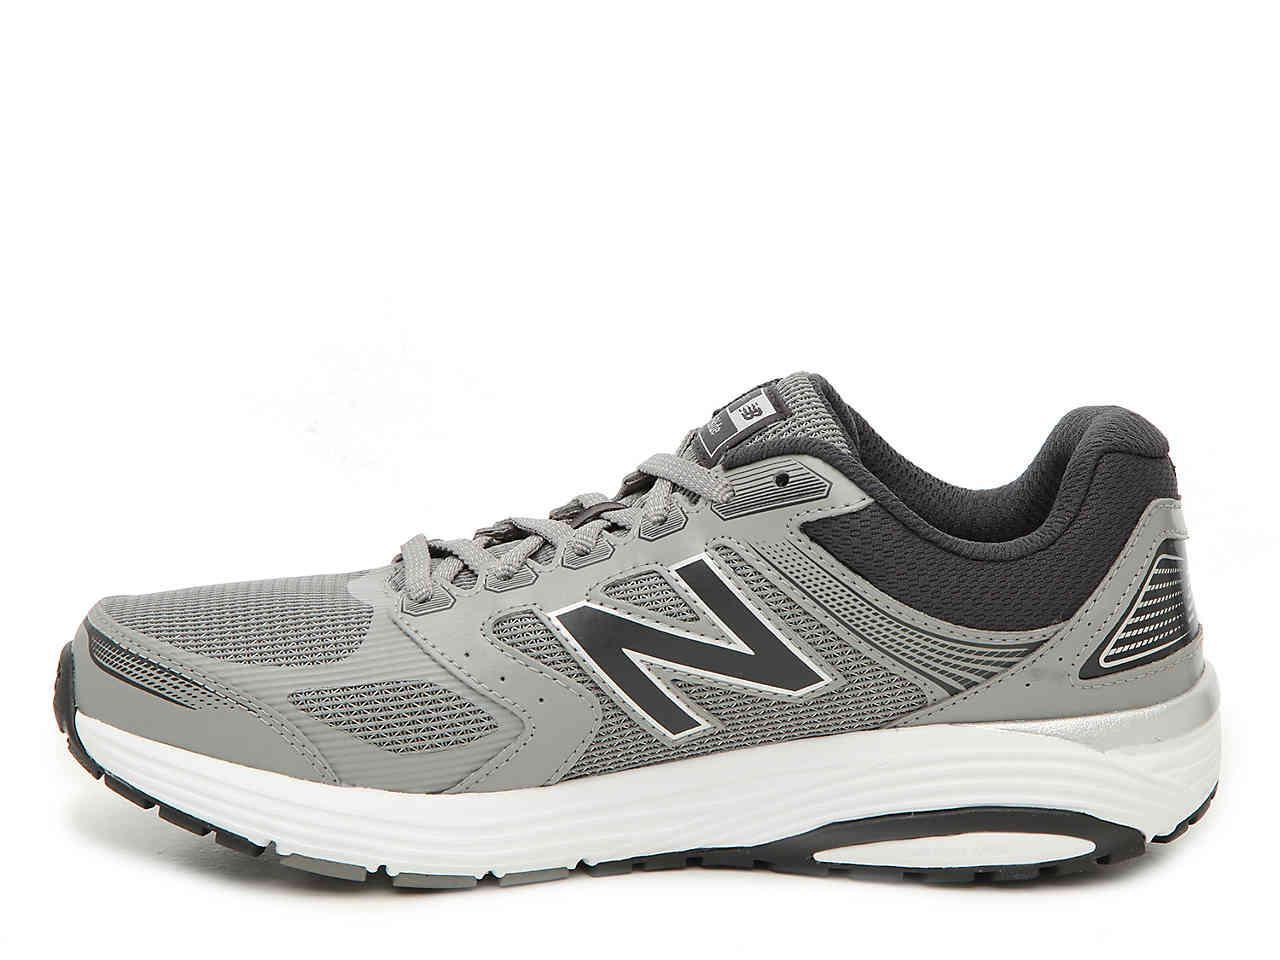 New Balance Synthetic 560v7 Cushioning Running Shoe in Grey (Gray ...